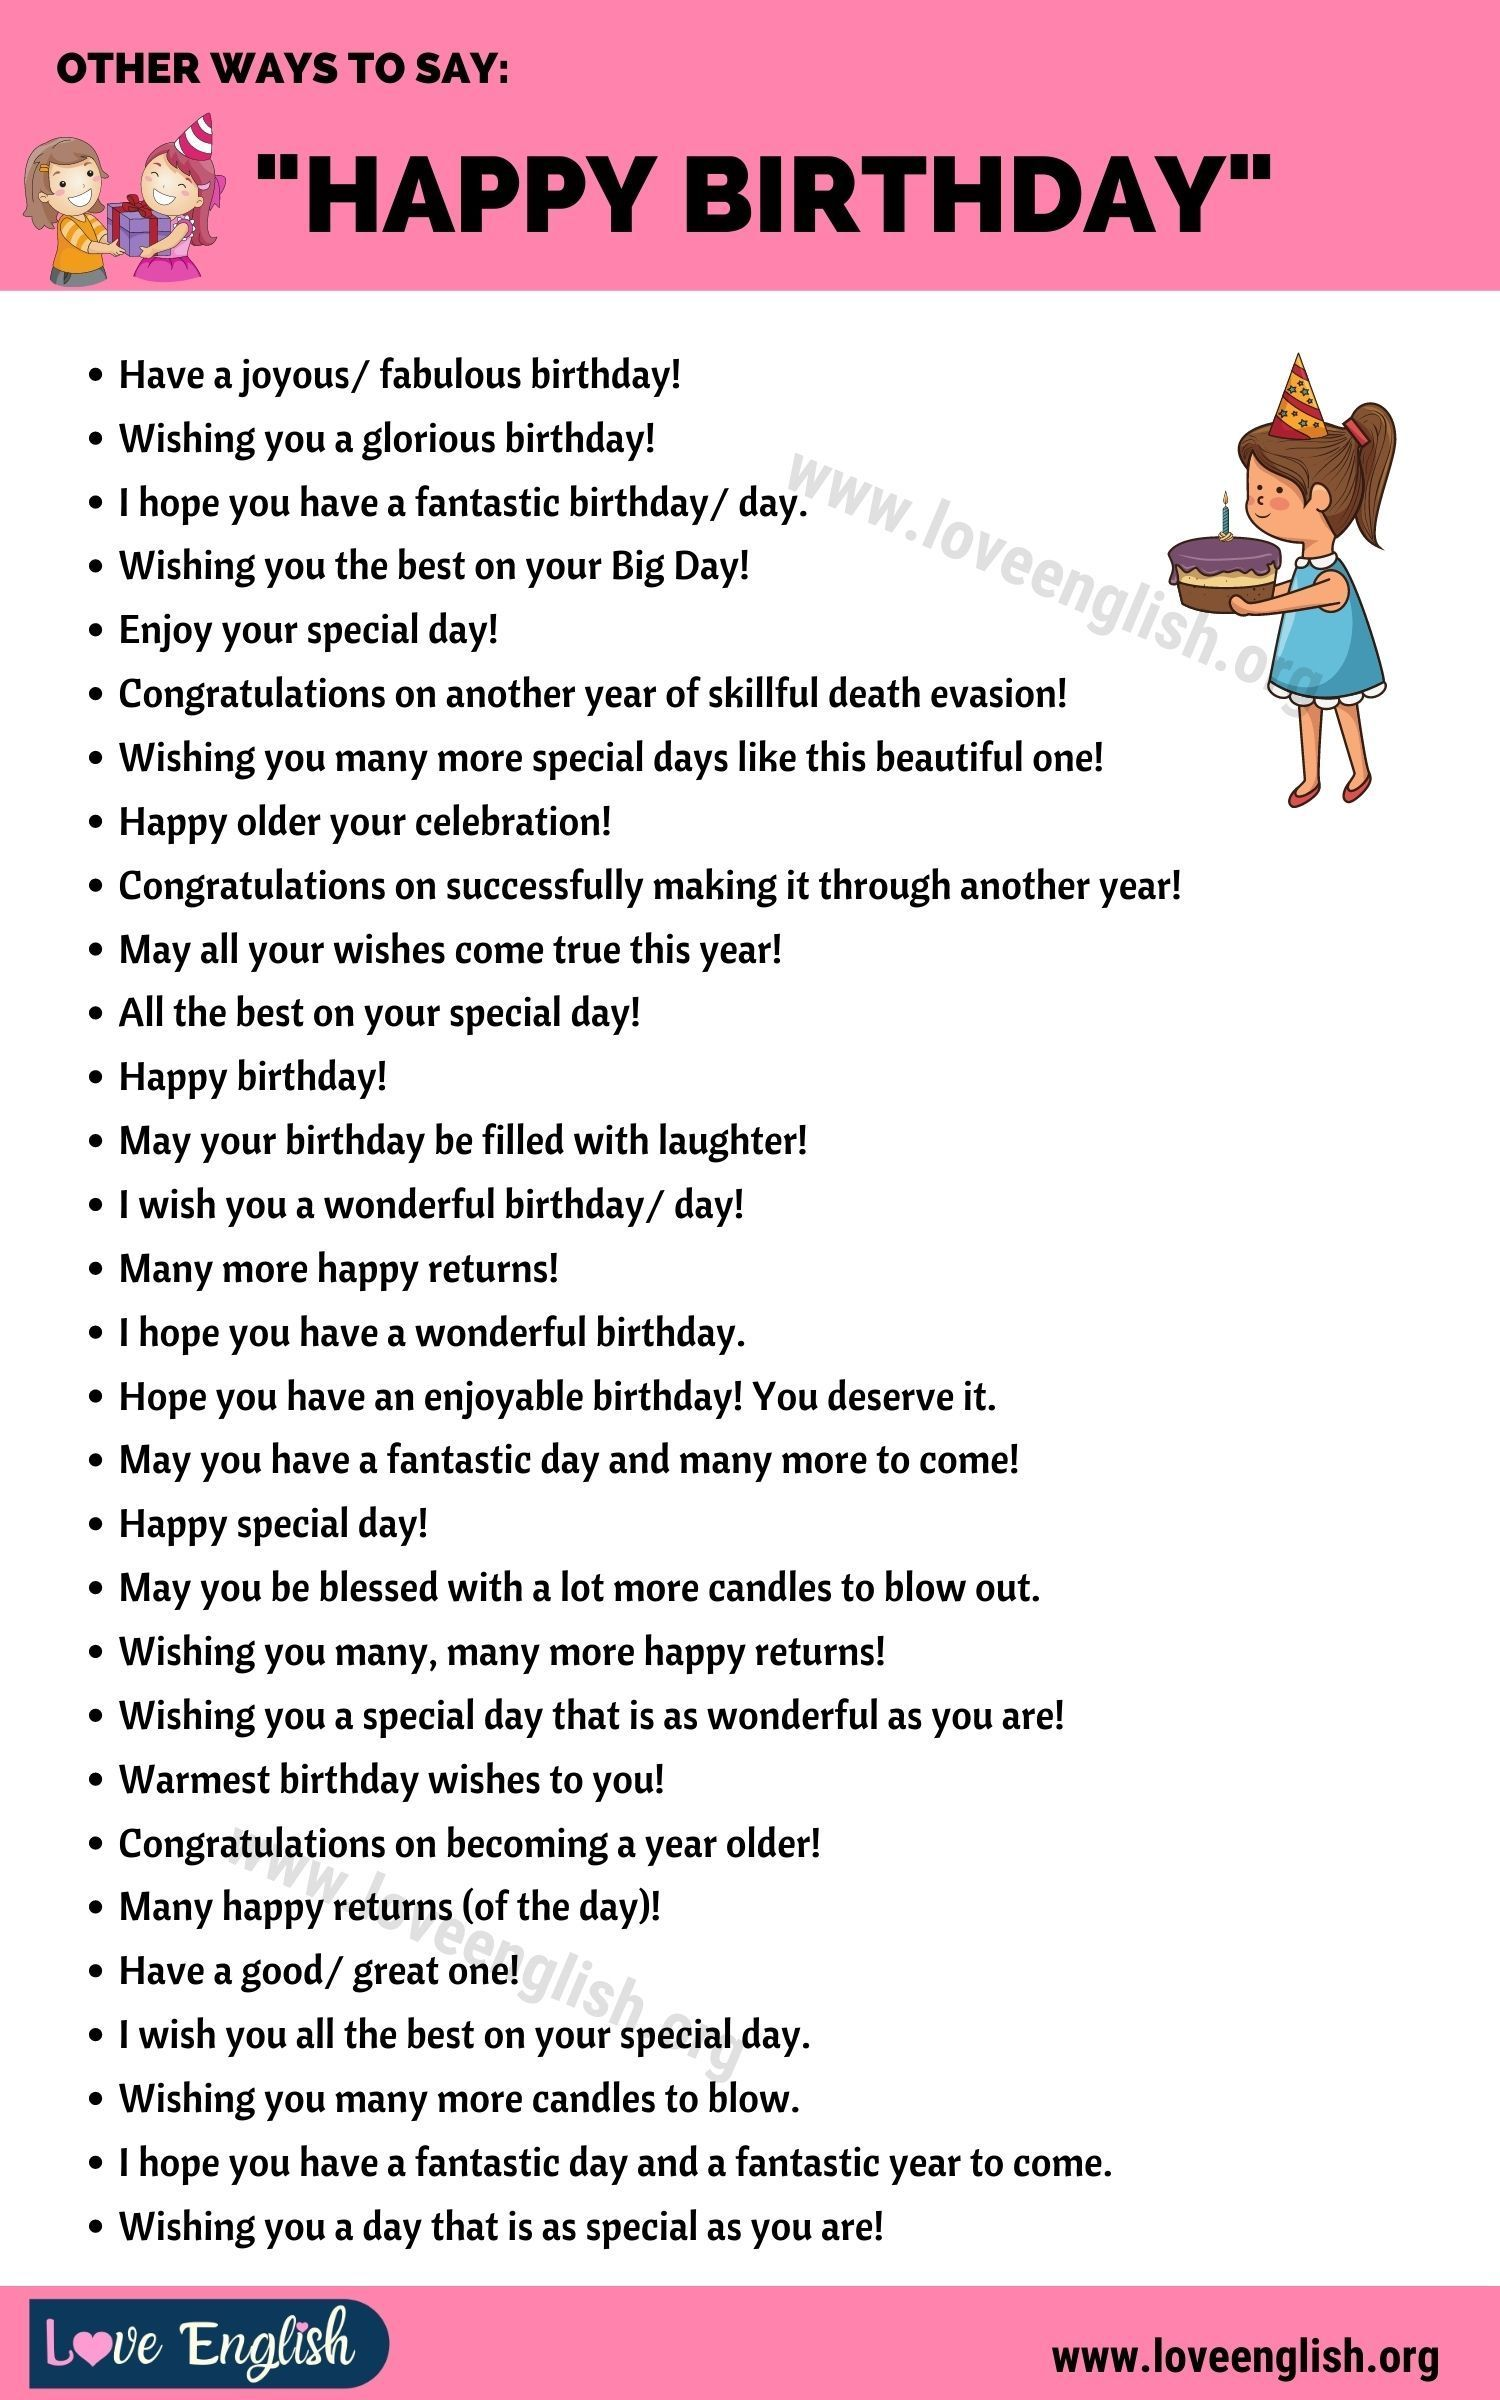 Birthday Wishes 35 Funny Ways To Say Happy Birthday In English Love English Friend Birthday Quotes Birthday Quotes Funny Happy Birthday Quotes For Friends